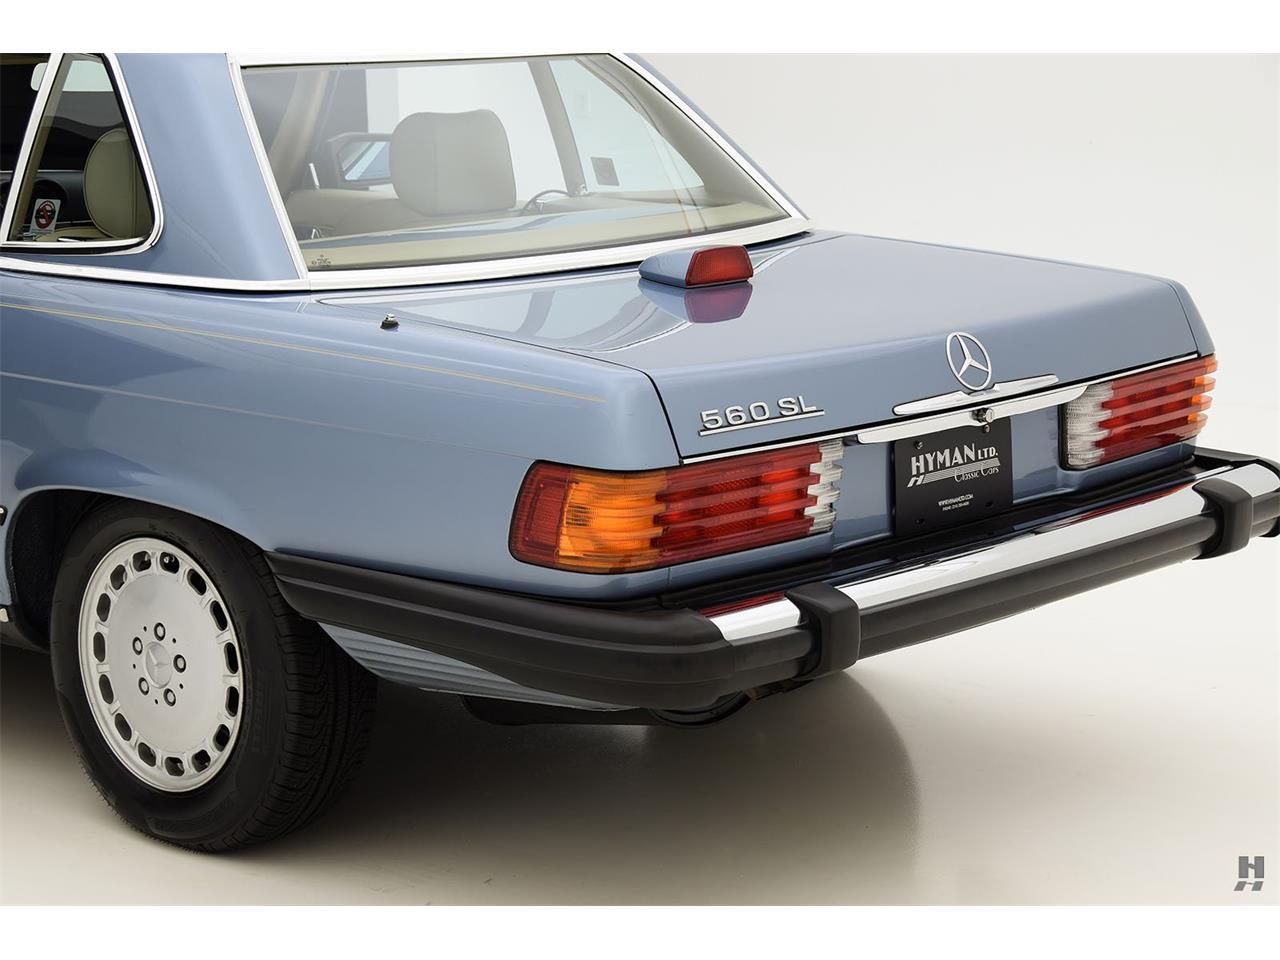 Large Picture of 1987 Mercedes-Benz 560SL - $48,500.00 - LENL